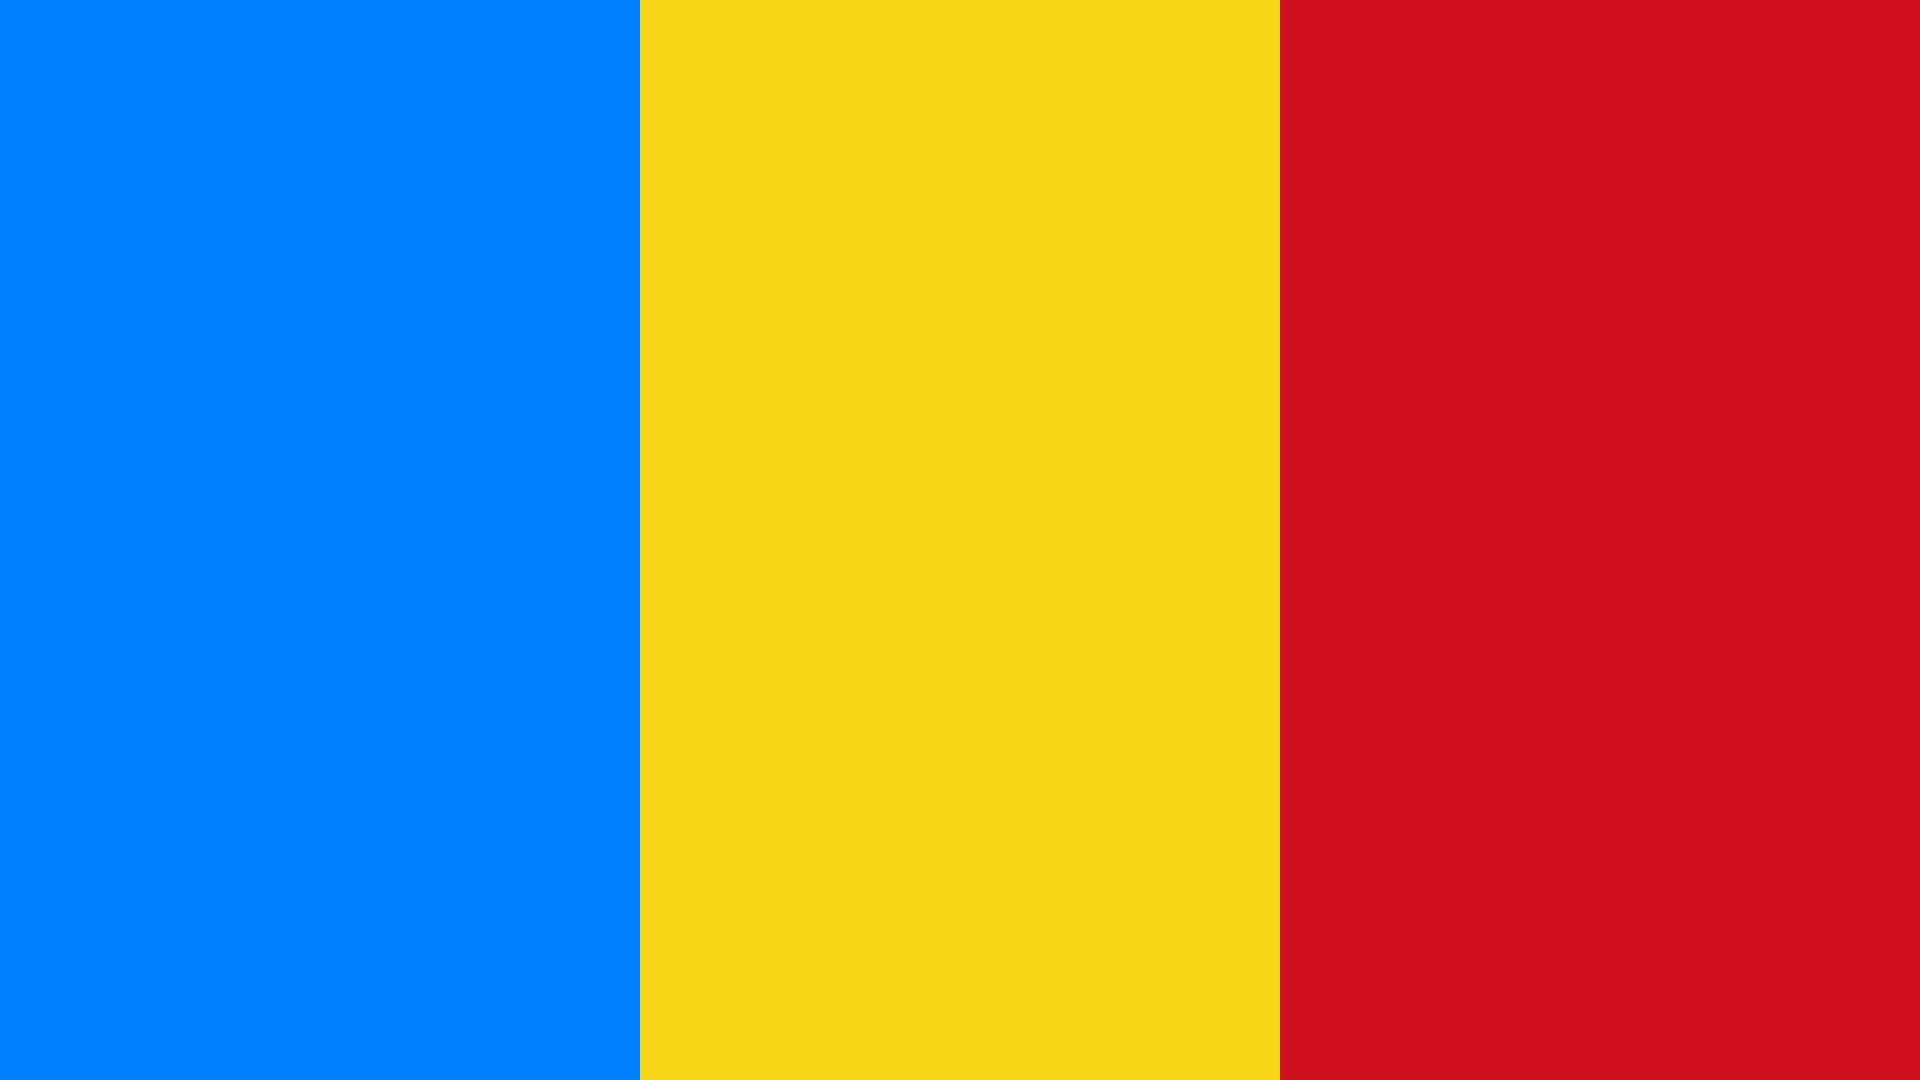 Democratic Republic Of The Congo Flag Color Palette Congo Flag Flag Colors Democratic Republic Of The Congo